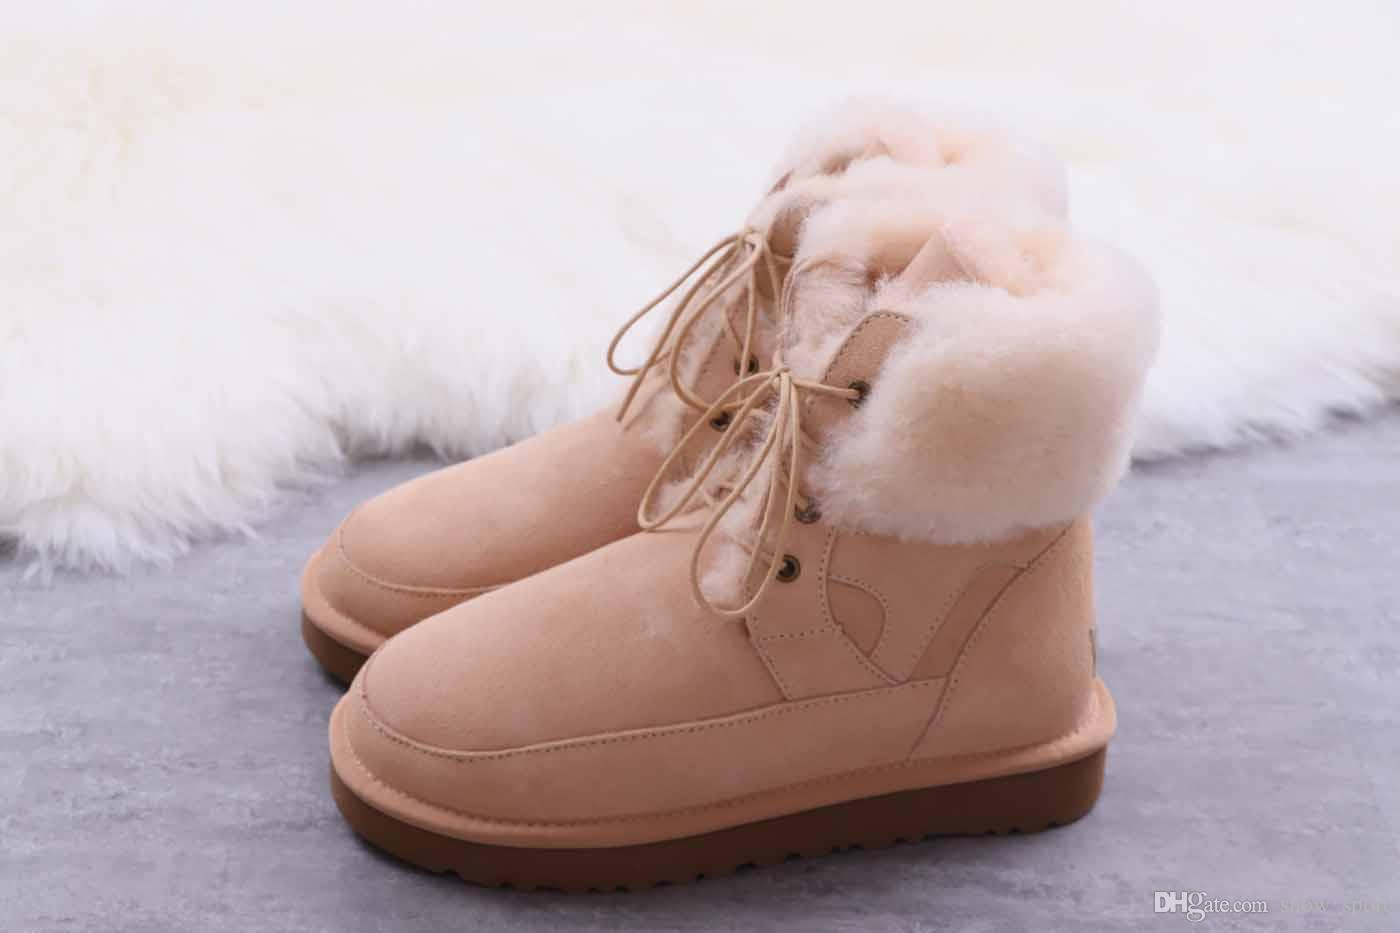 ee40876d Compre Ugg Boots NUEVO ACOGEDOR Piel De Oveja De Calidad Superior Ugg Botas  Para La Nieve Estilo Australia Estilo CLASSIC MINI FLUFF BOTA ACOLCHADA  Botas De ...